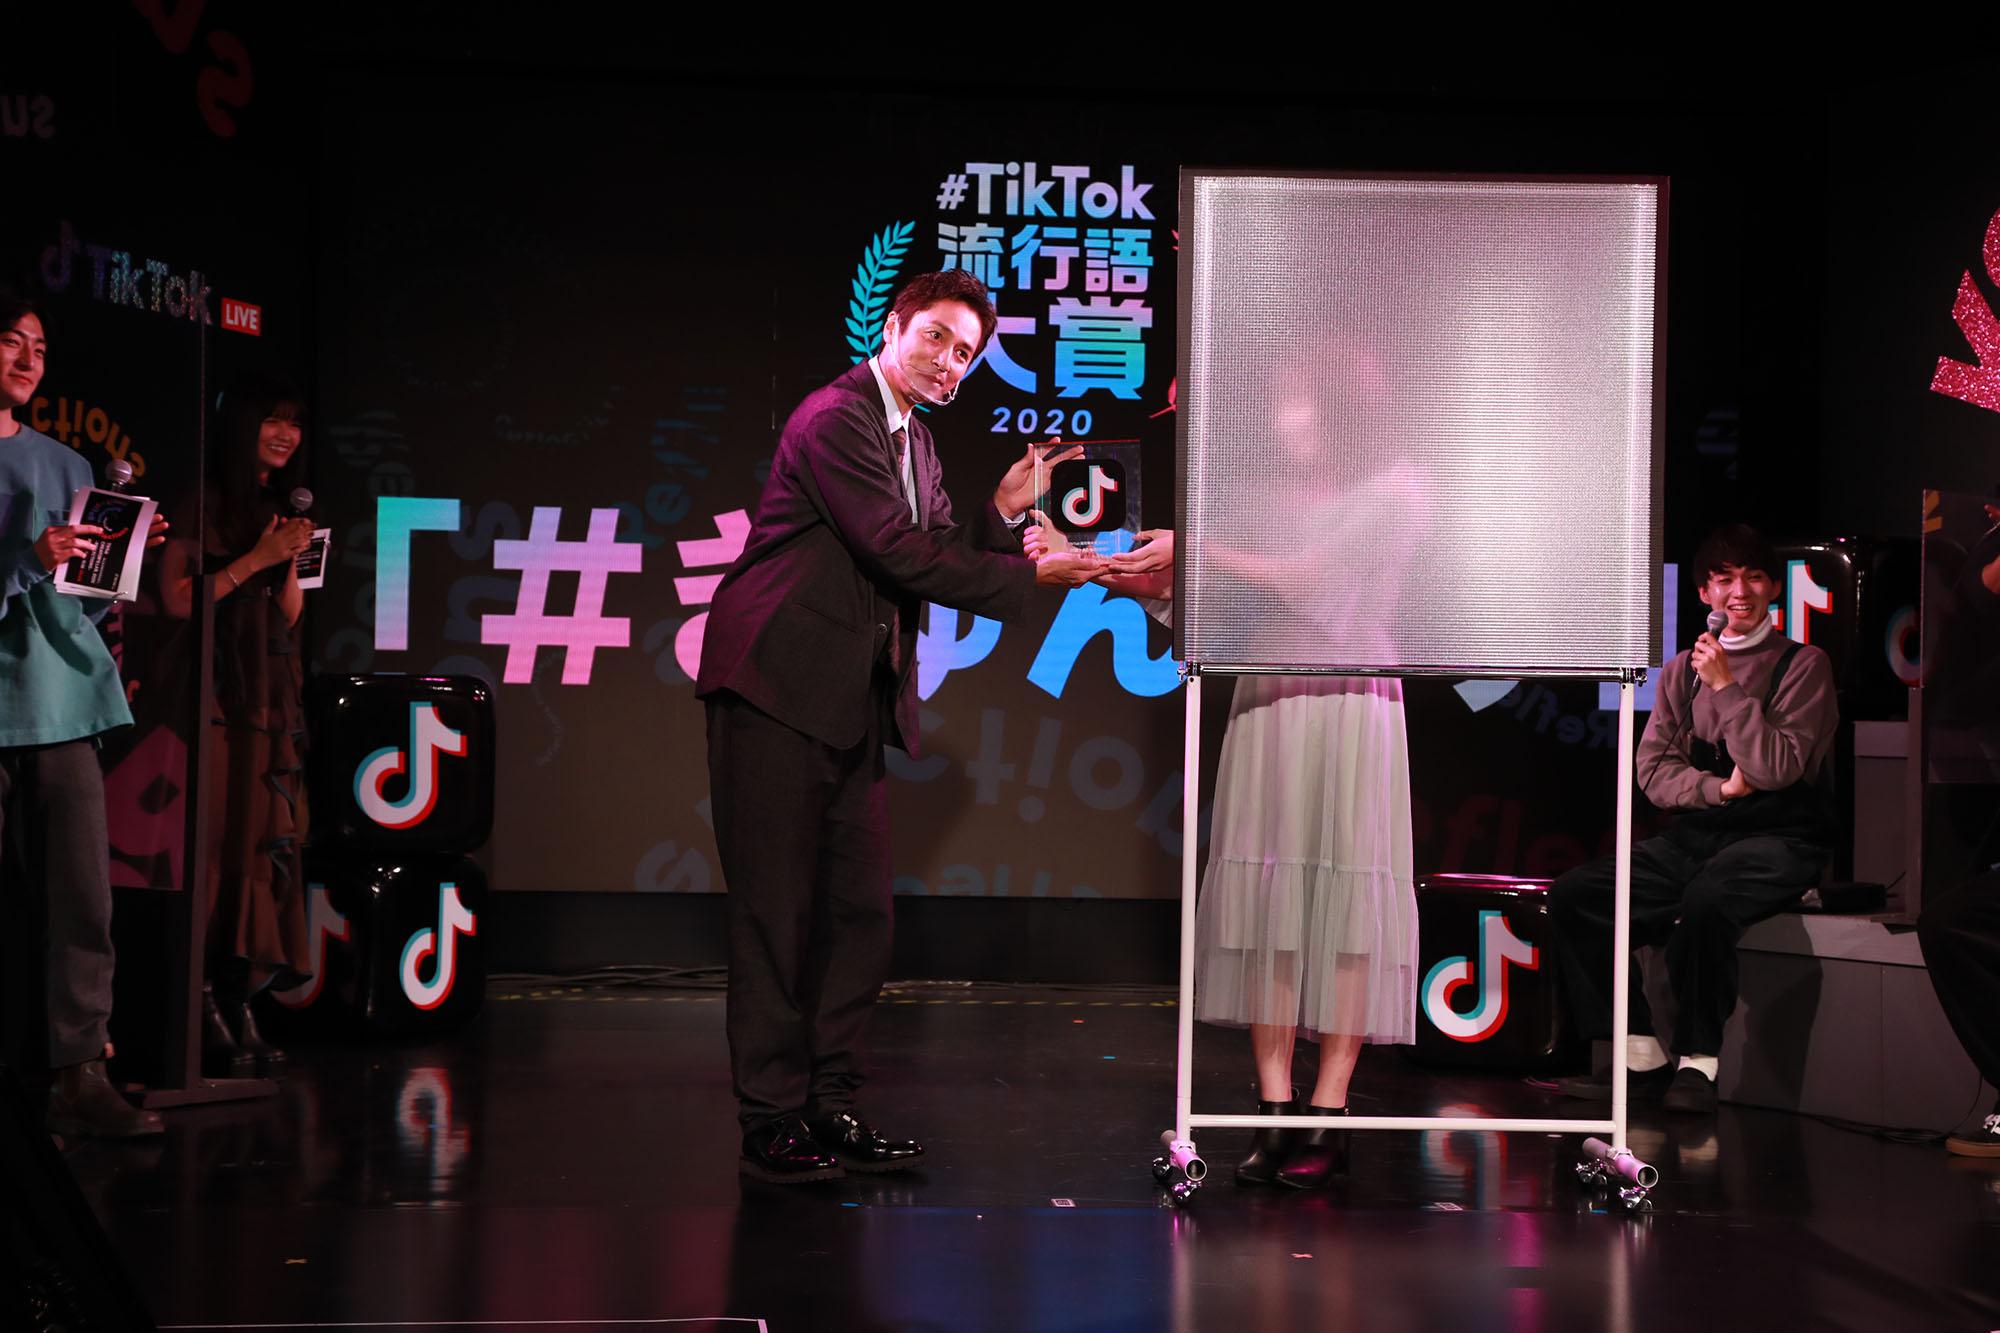 「TikTok流行語大賞2020」大賞受賞シーン。チュートリアル徳井よりひらめへ盾が贈られた/PHOTO :SANGPIL PARK